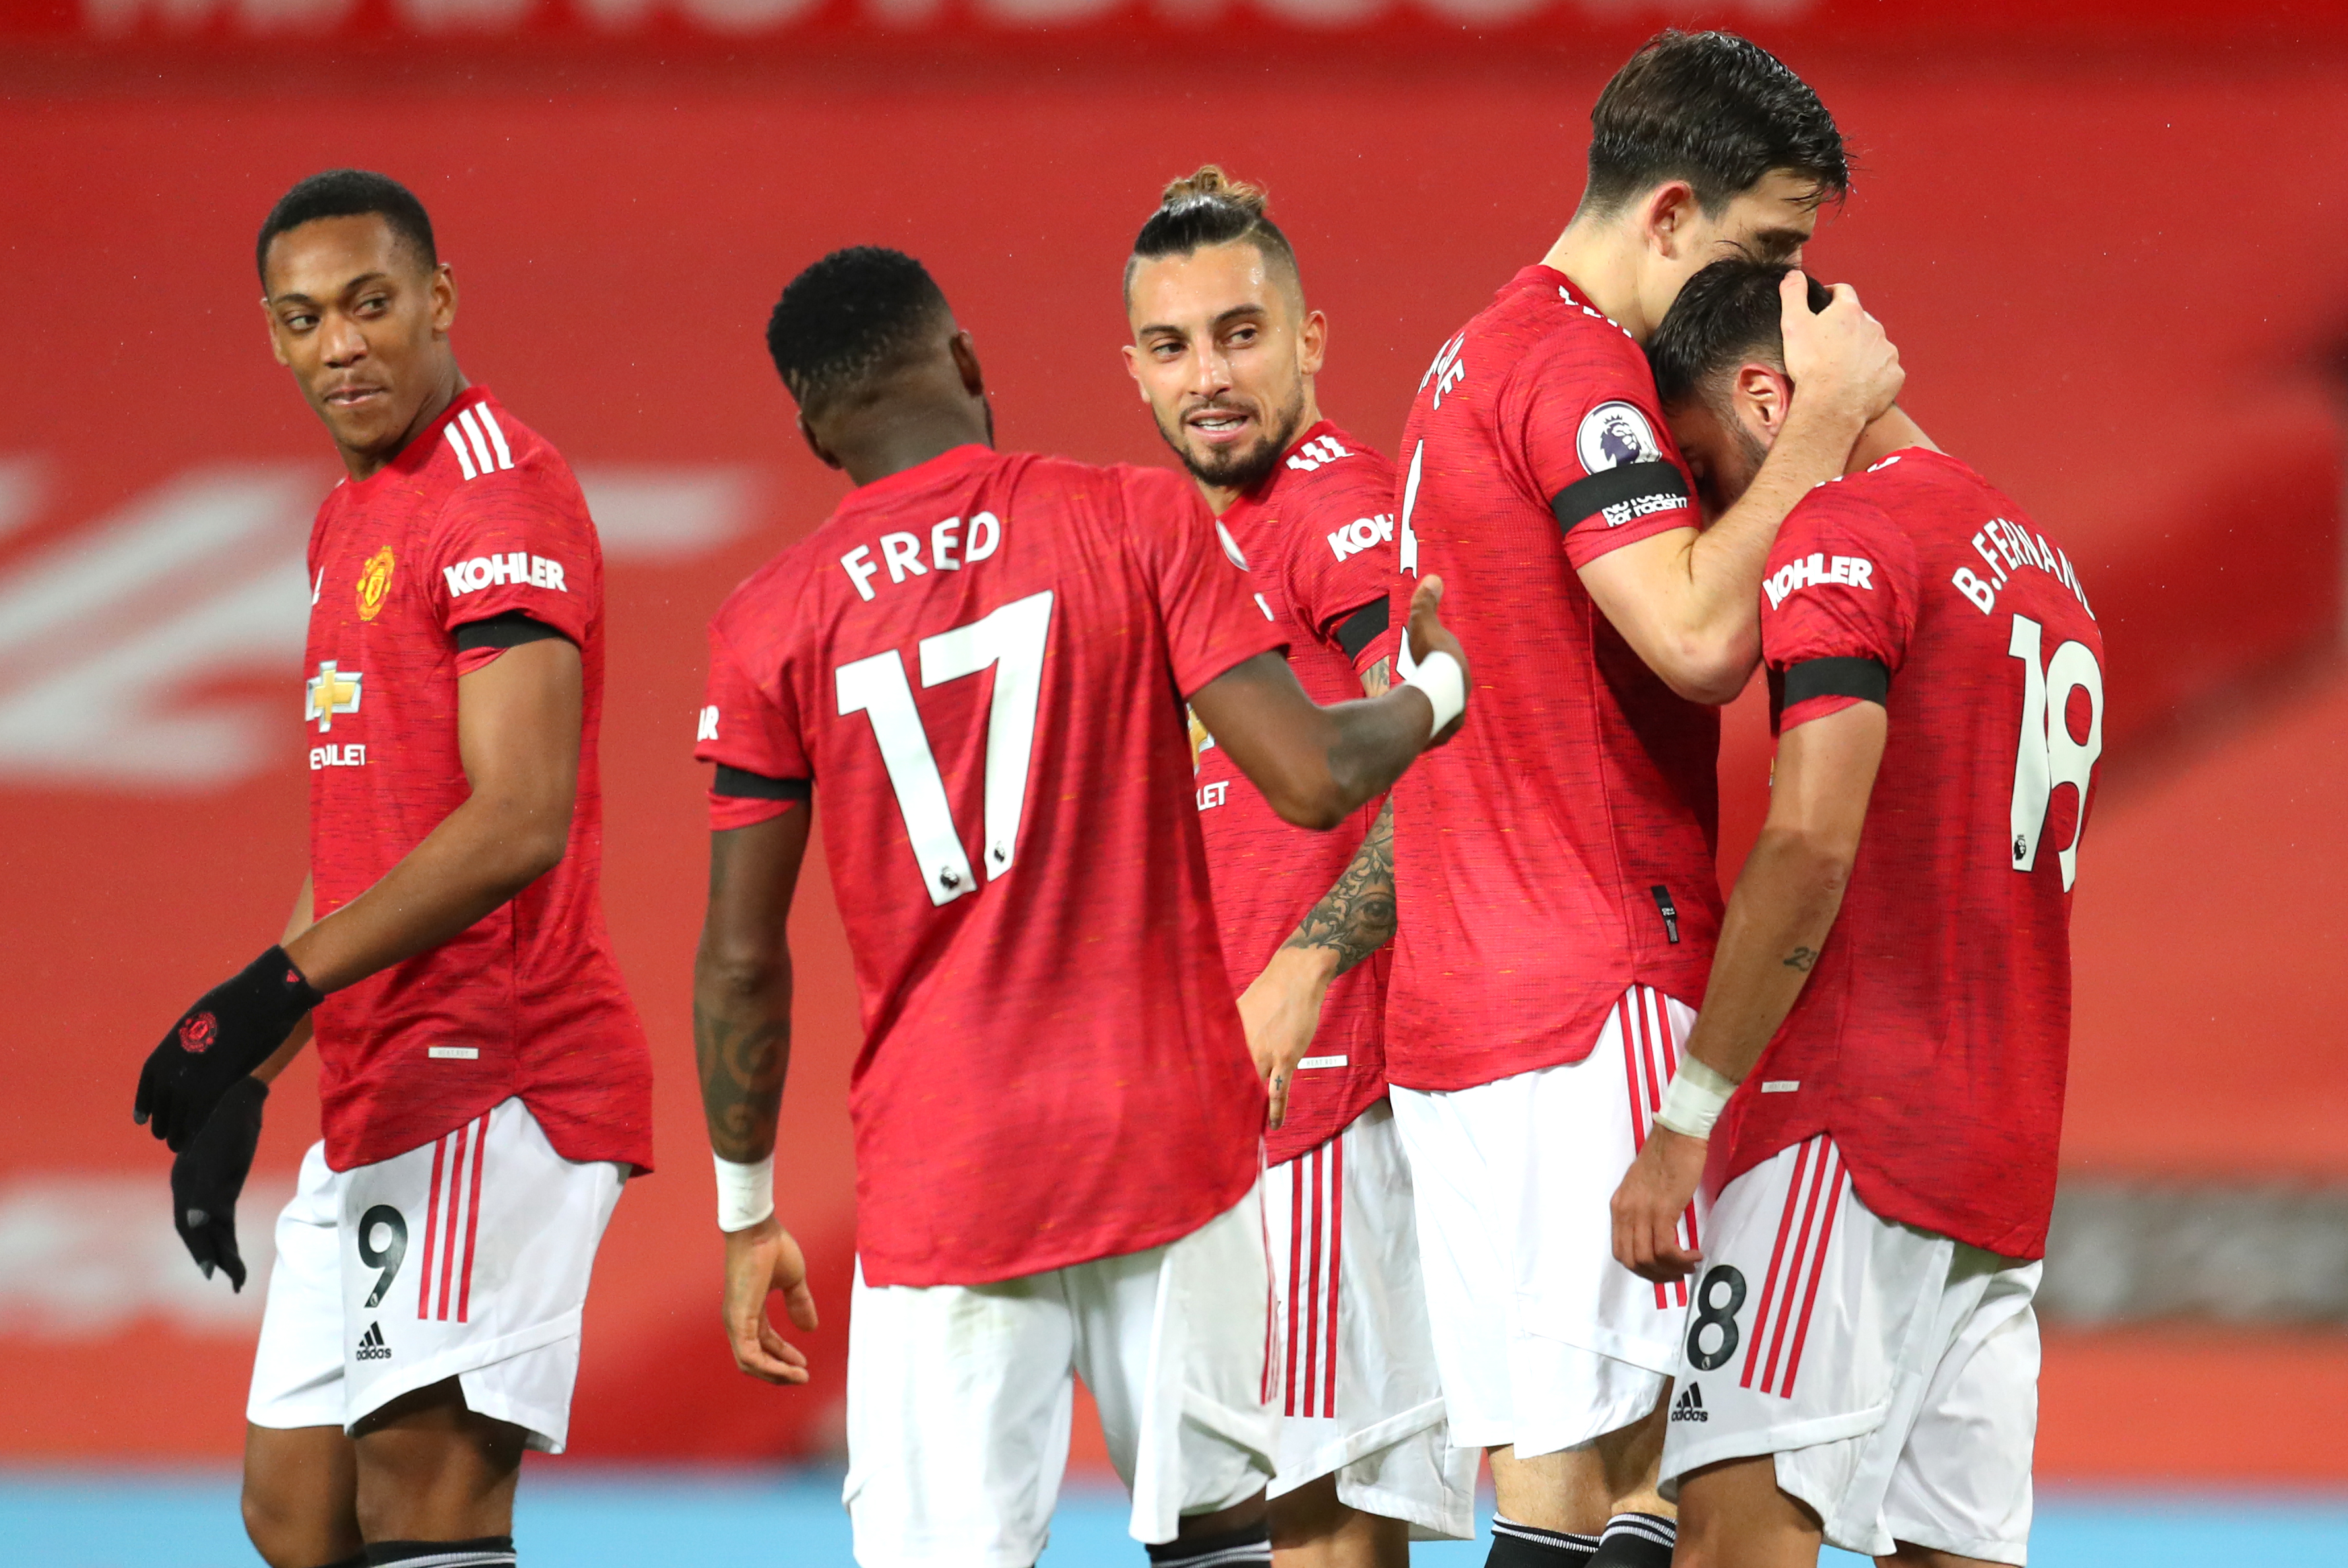 29/11/2020 Daily Predictions: English Premier League 2020-21, Southampton vs. Manchester United